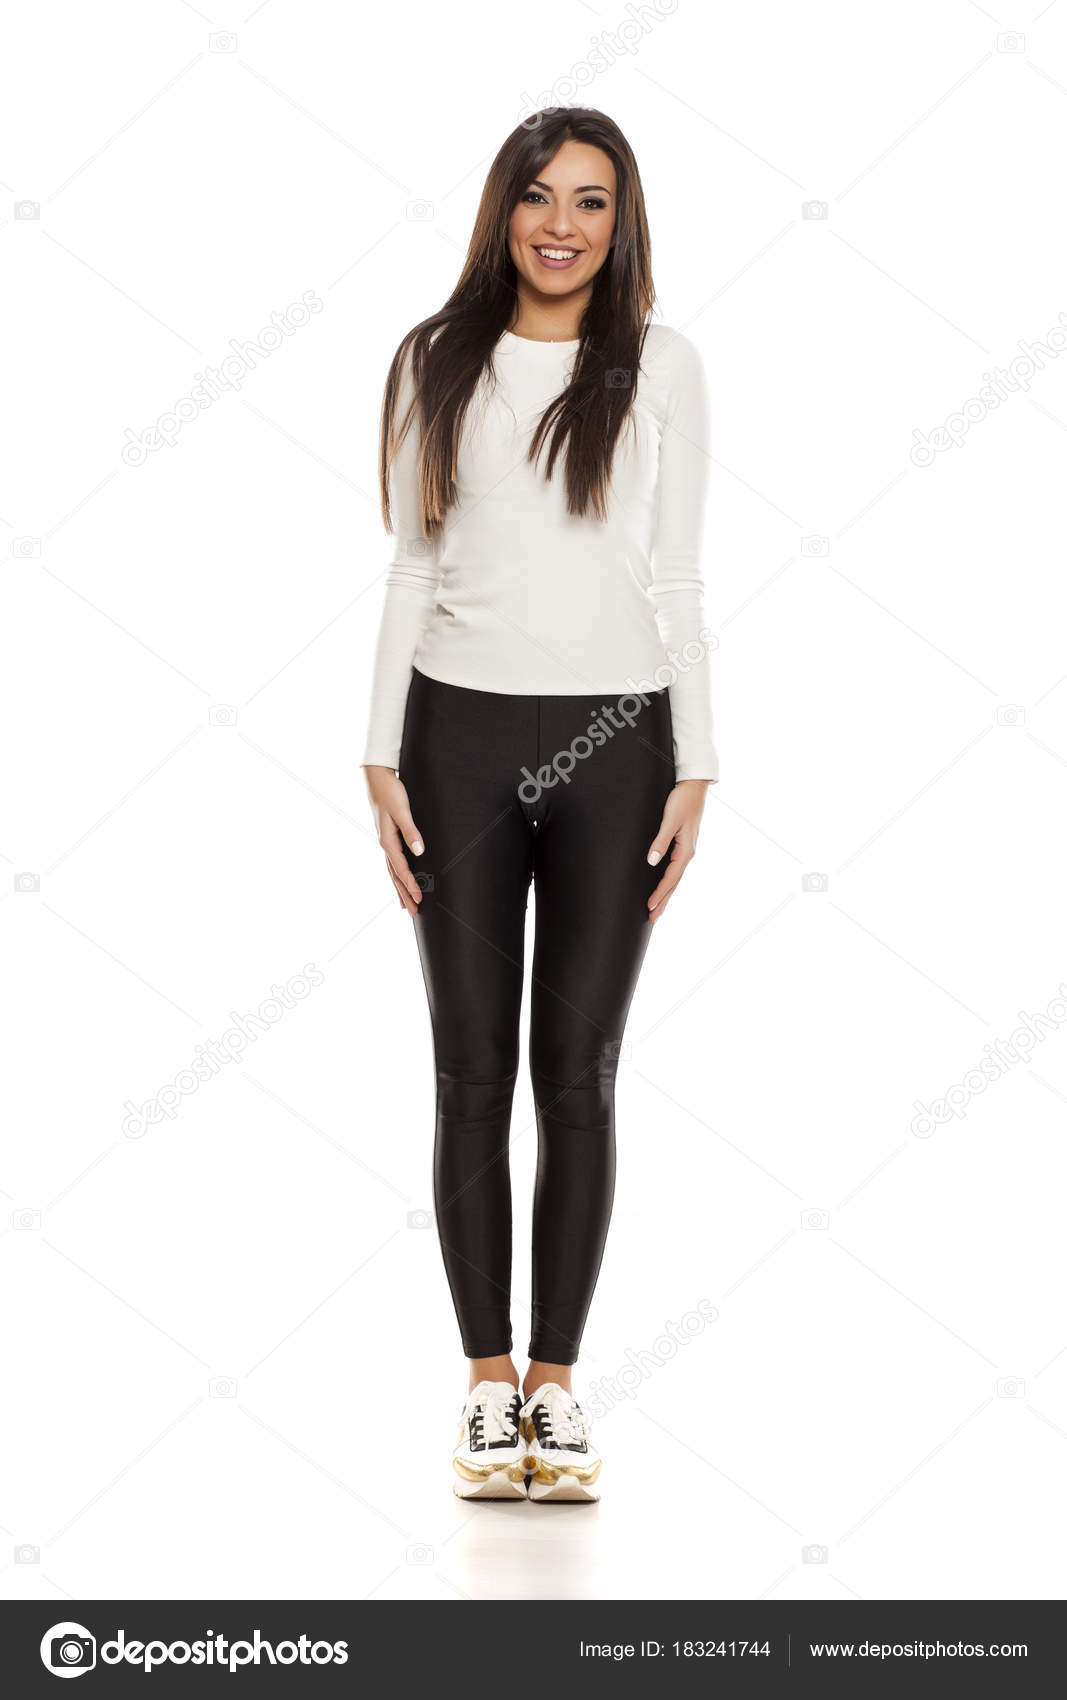 3b9386709a19 Νεαρή Όμορφη Γυναίκα Στο Μαύρο Κολάν Λευκή Μπλούζα Και Sneakers — Φωτογραφία  Αρχείου